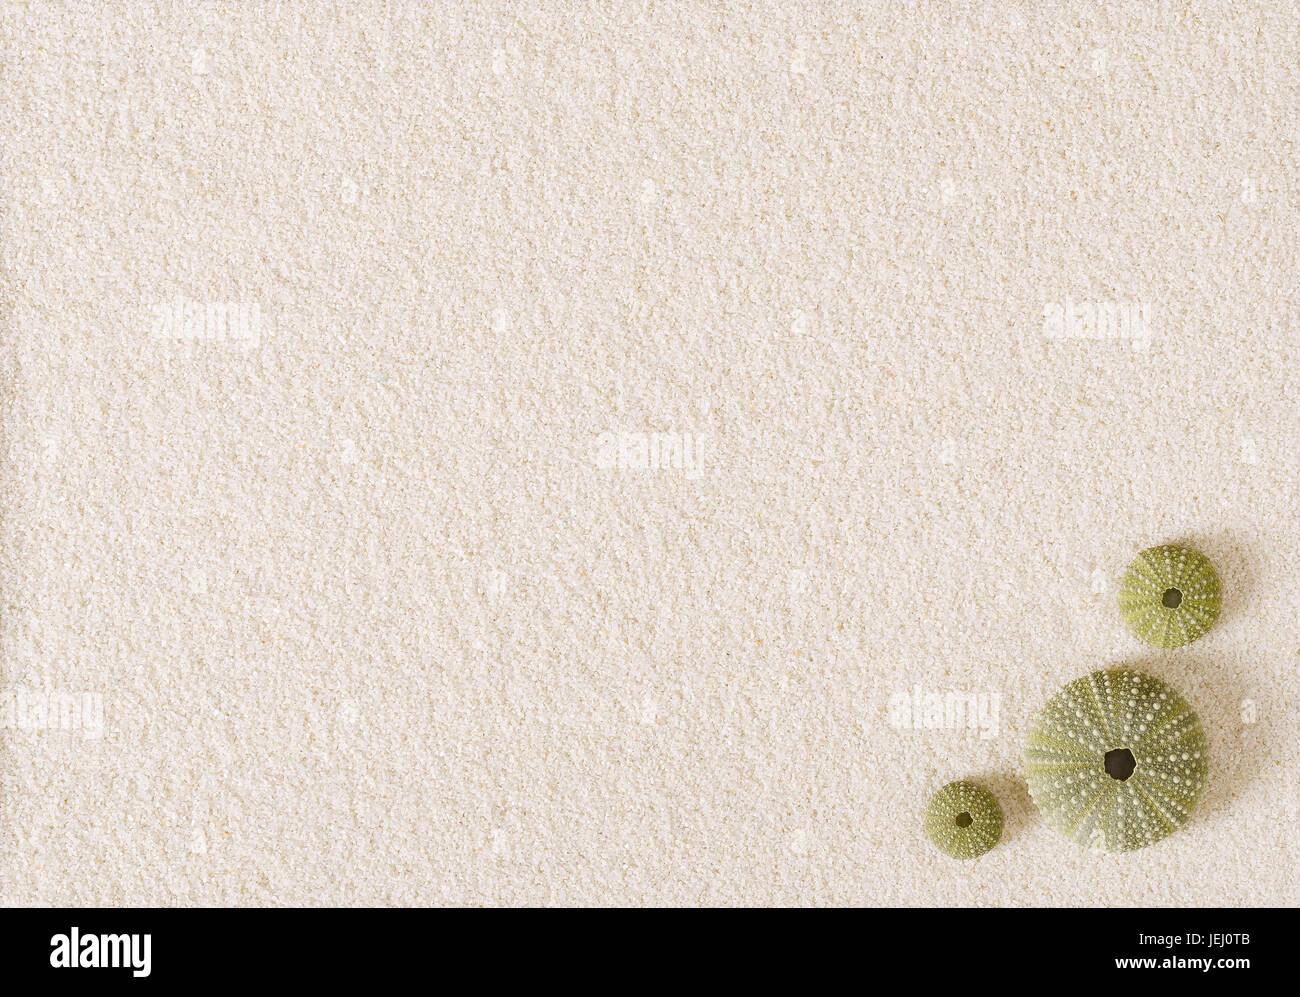 Three green sea urchin shells on flat white sand surface. Sea hedgehogs with globular endoskeletons. Psammechinus - Stock Image